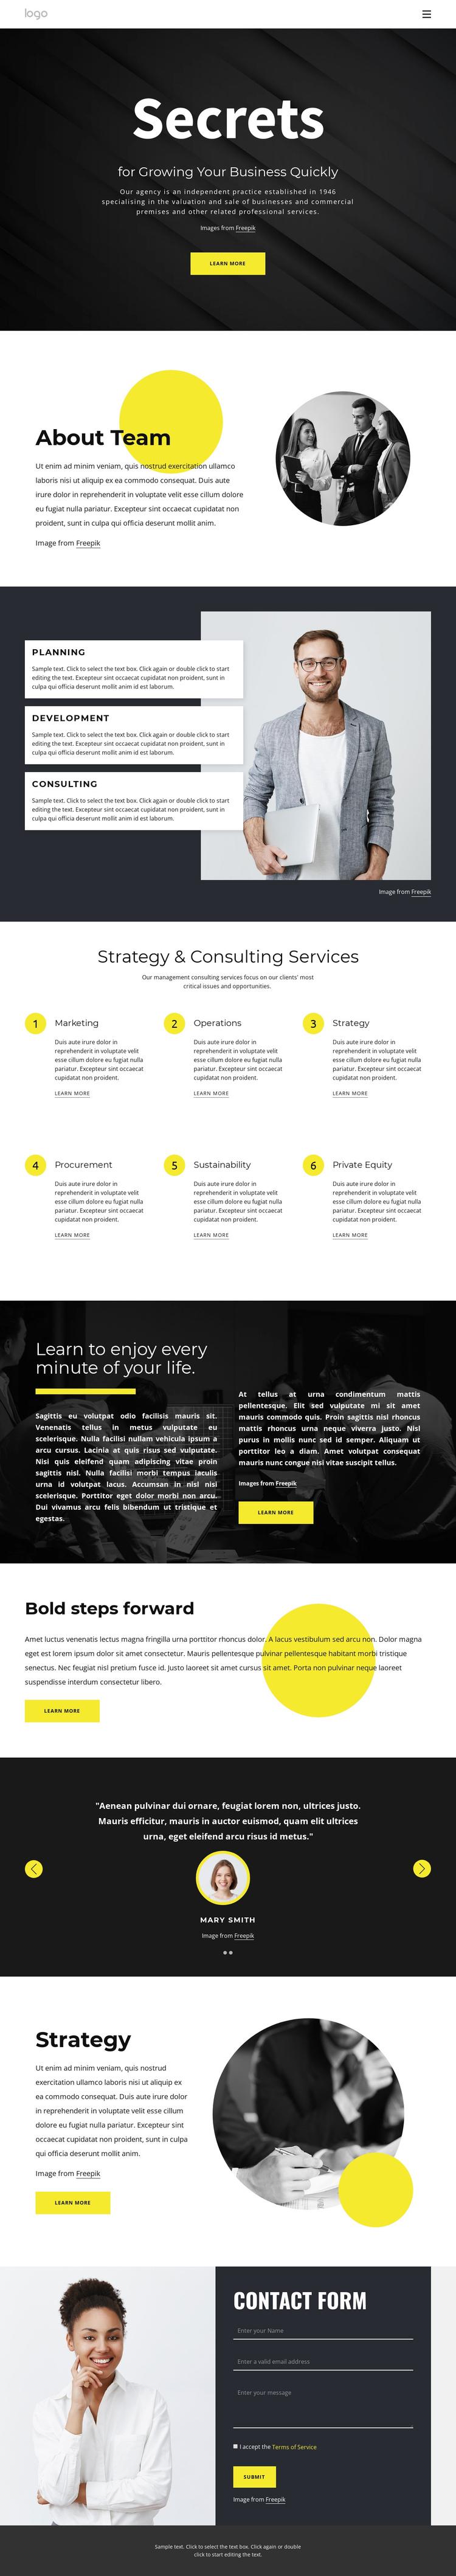 Secrets of growing business Website Builder Software